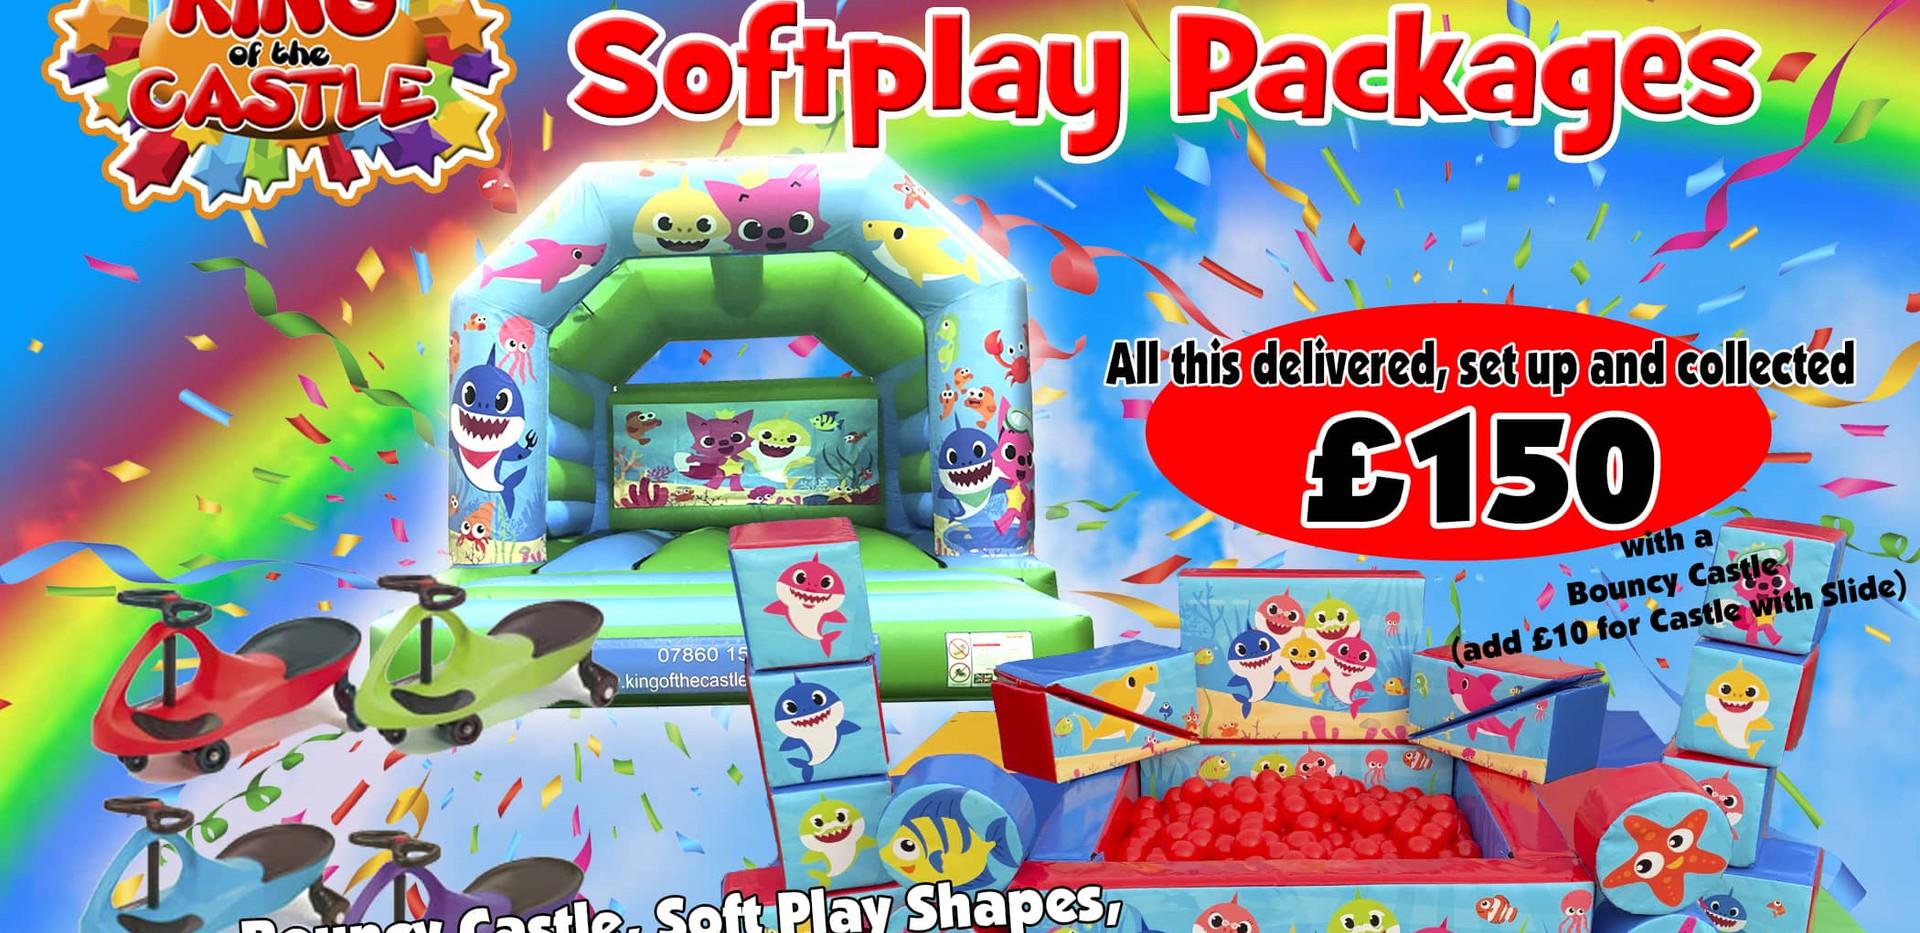 Soft Play - Baby Shark Package.jpg